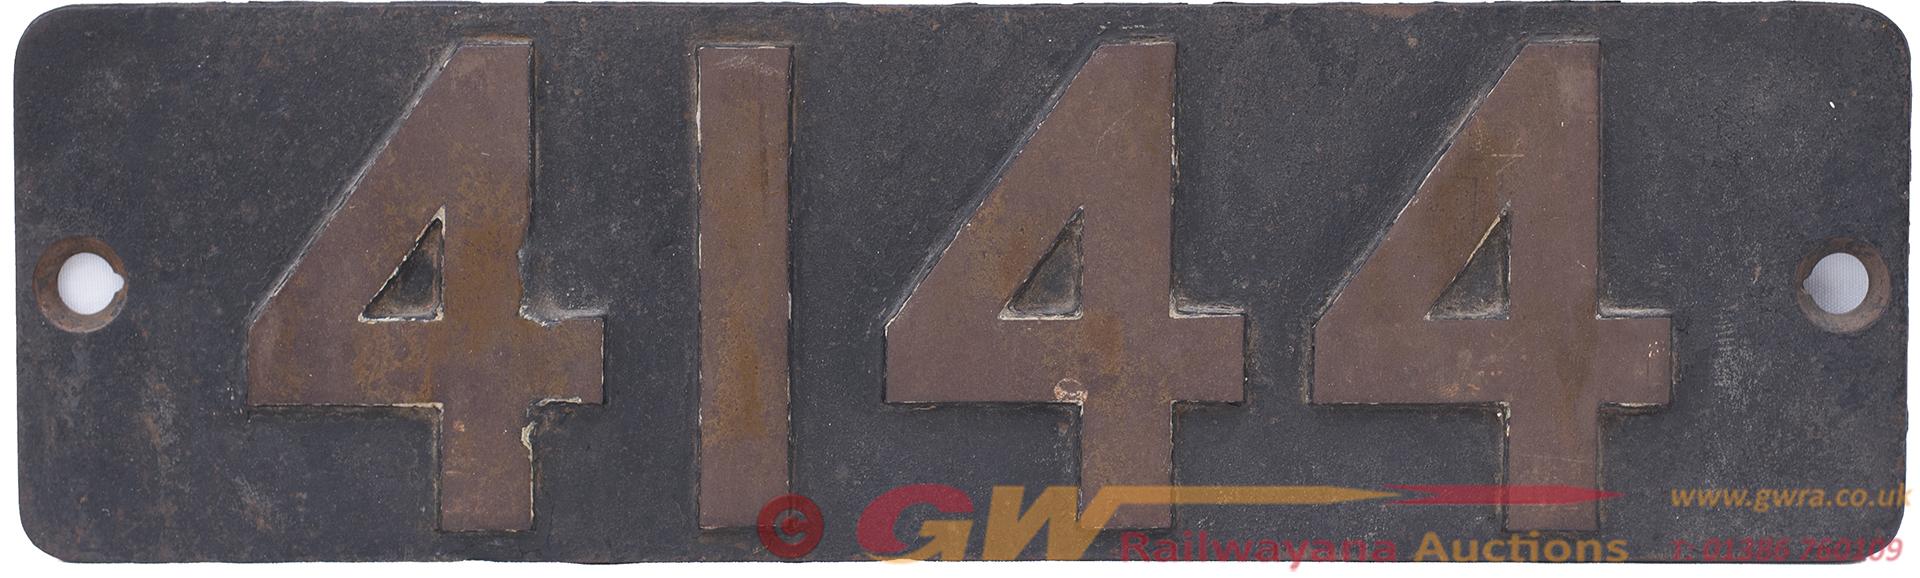 Smokebox Numberplate 4144 Ex GWR Collett 2-6-2 T